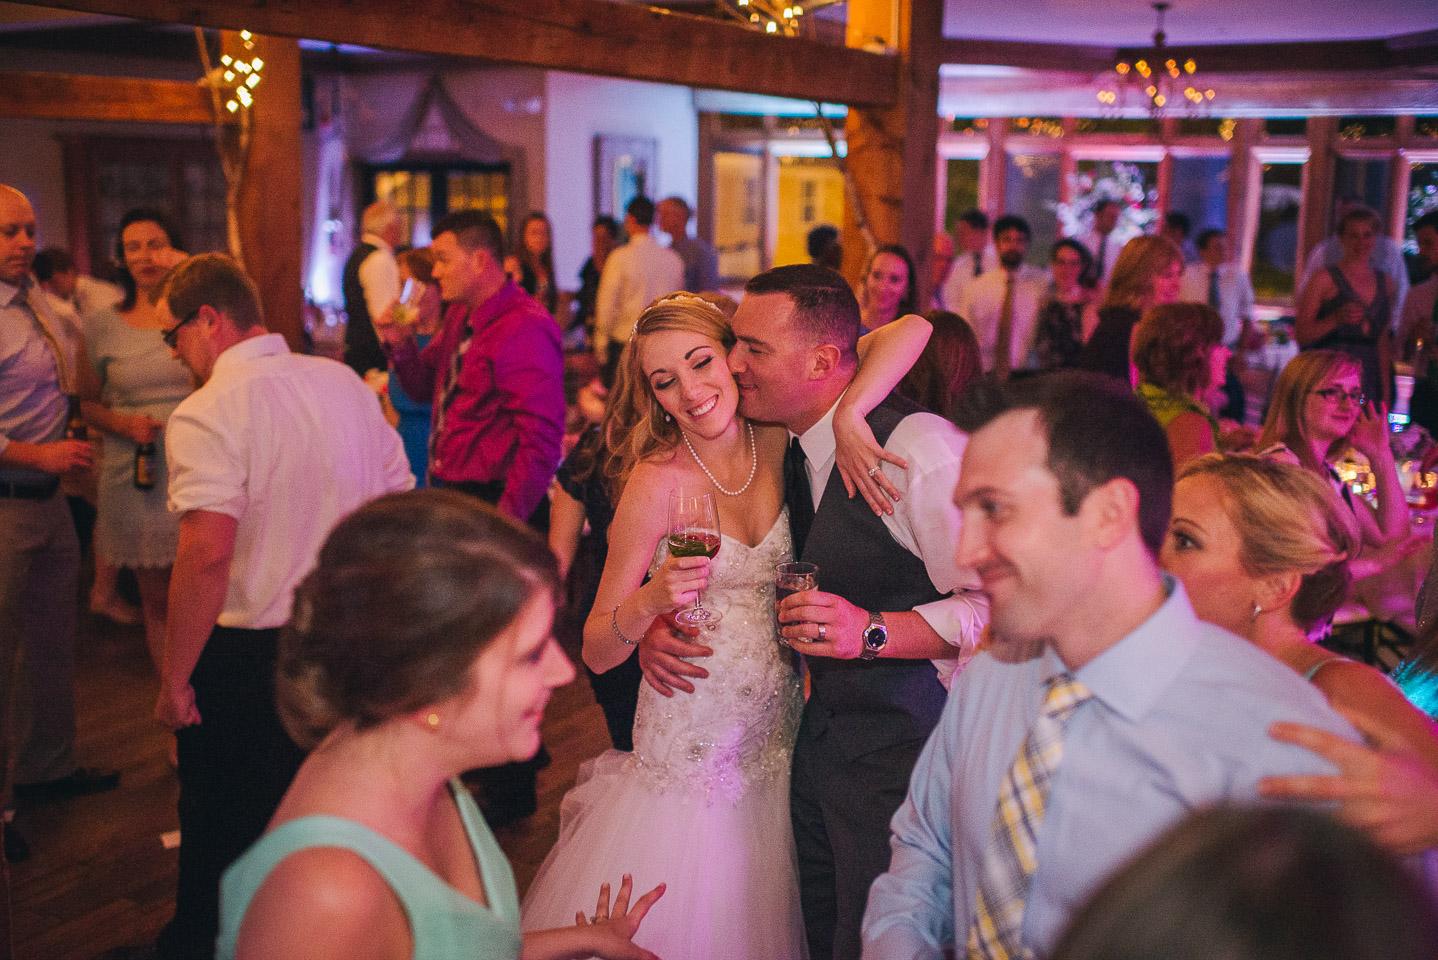 NH Wedding Photographer: guests dancing